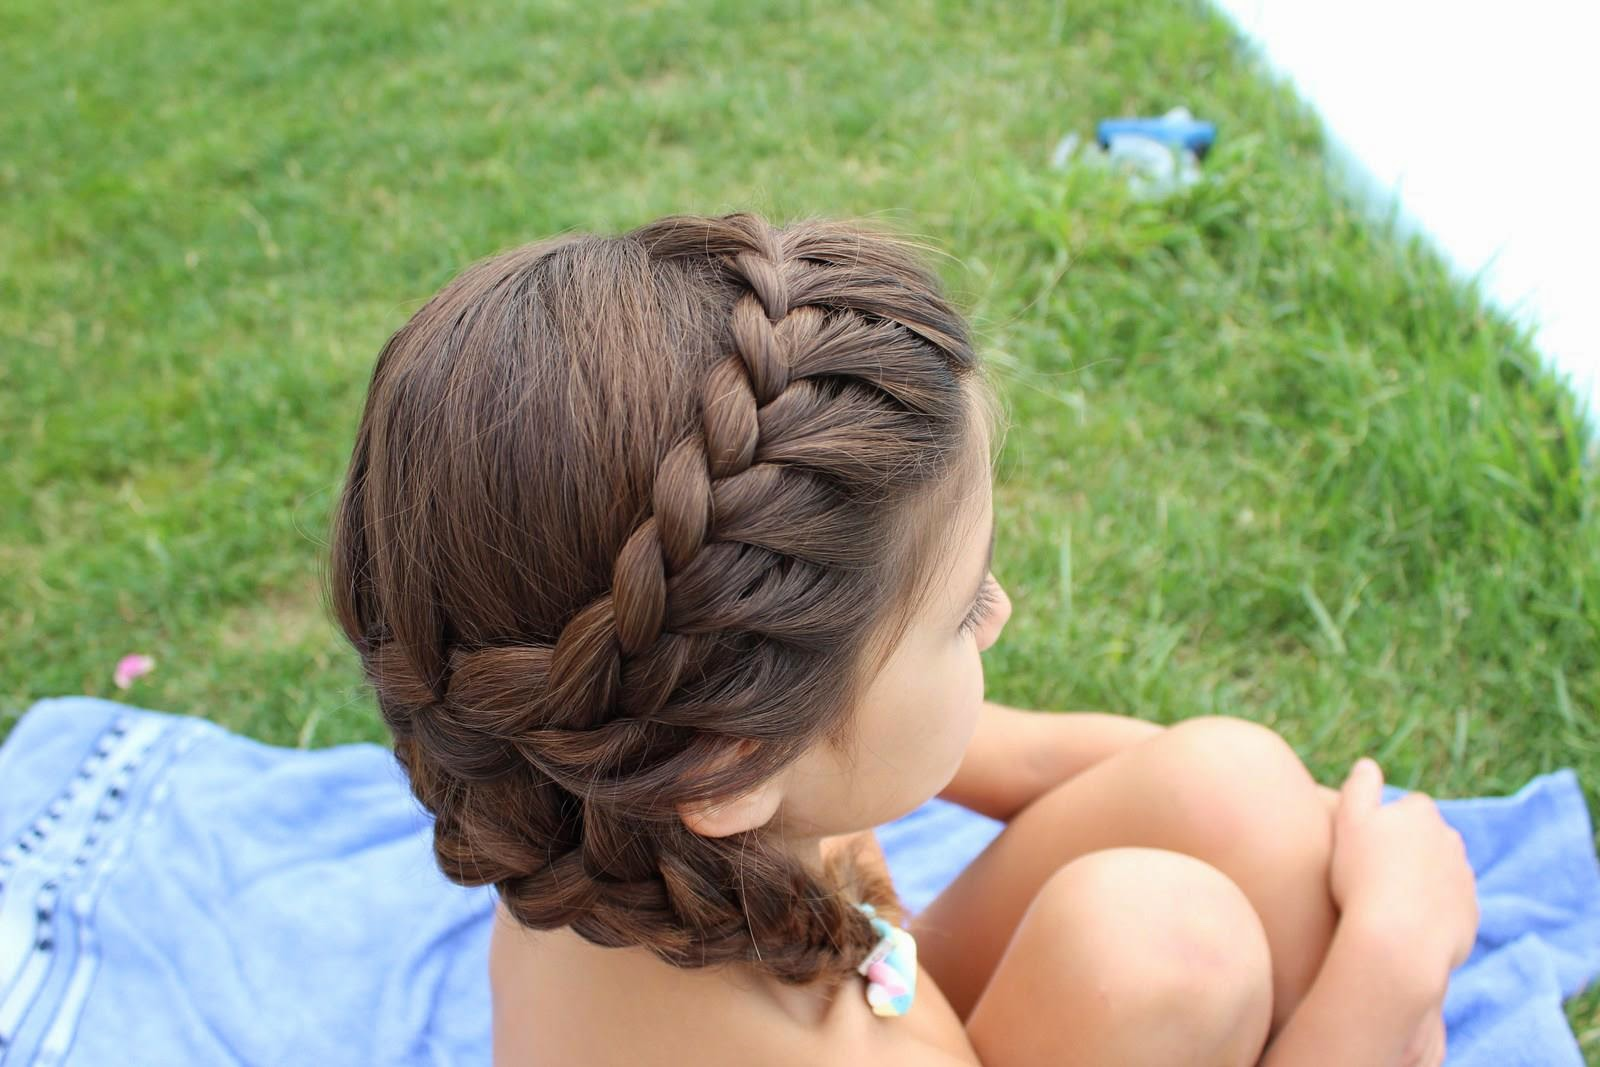 peinados con trenzas - Peinados Con Trenzas